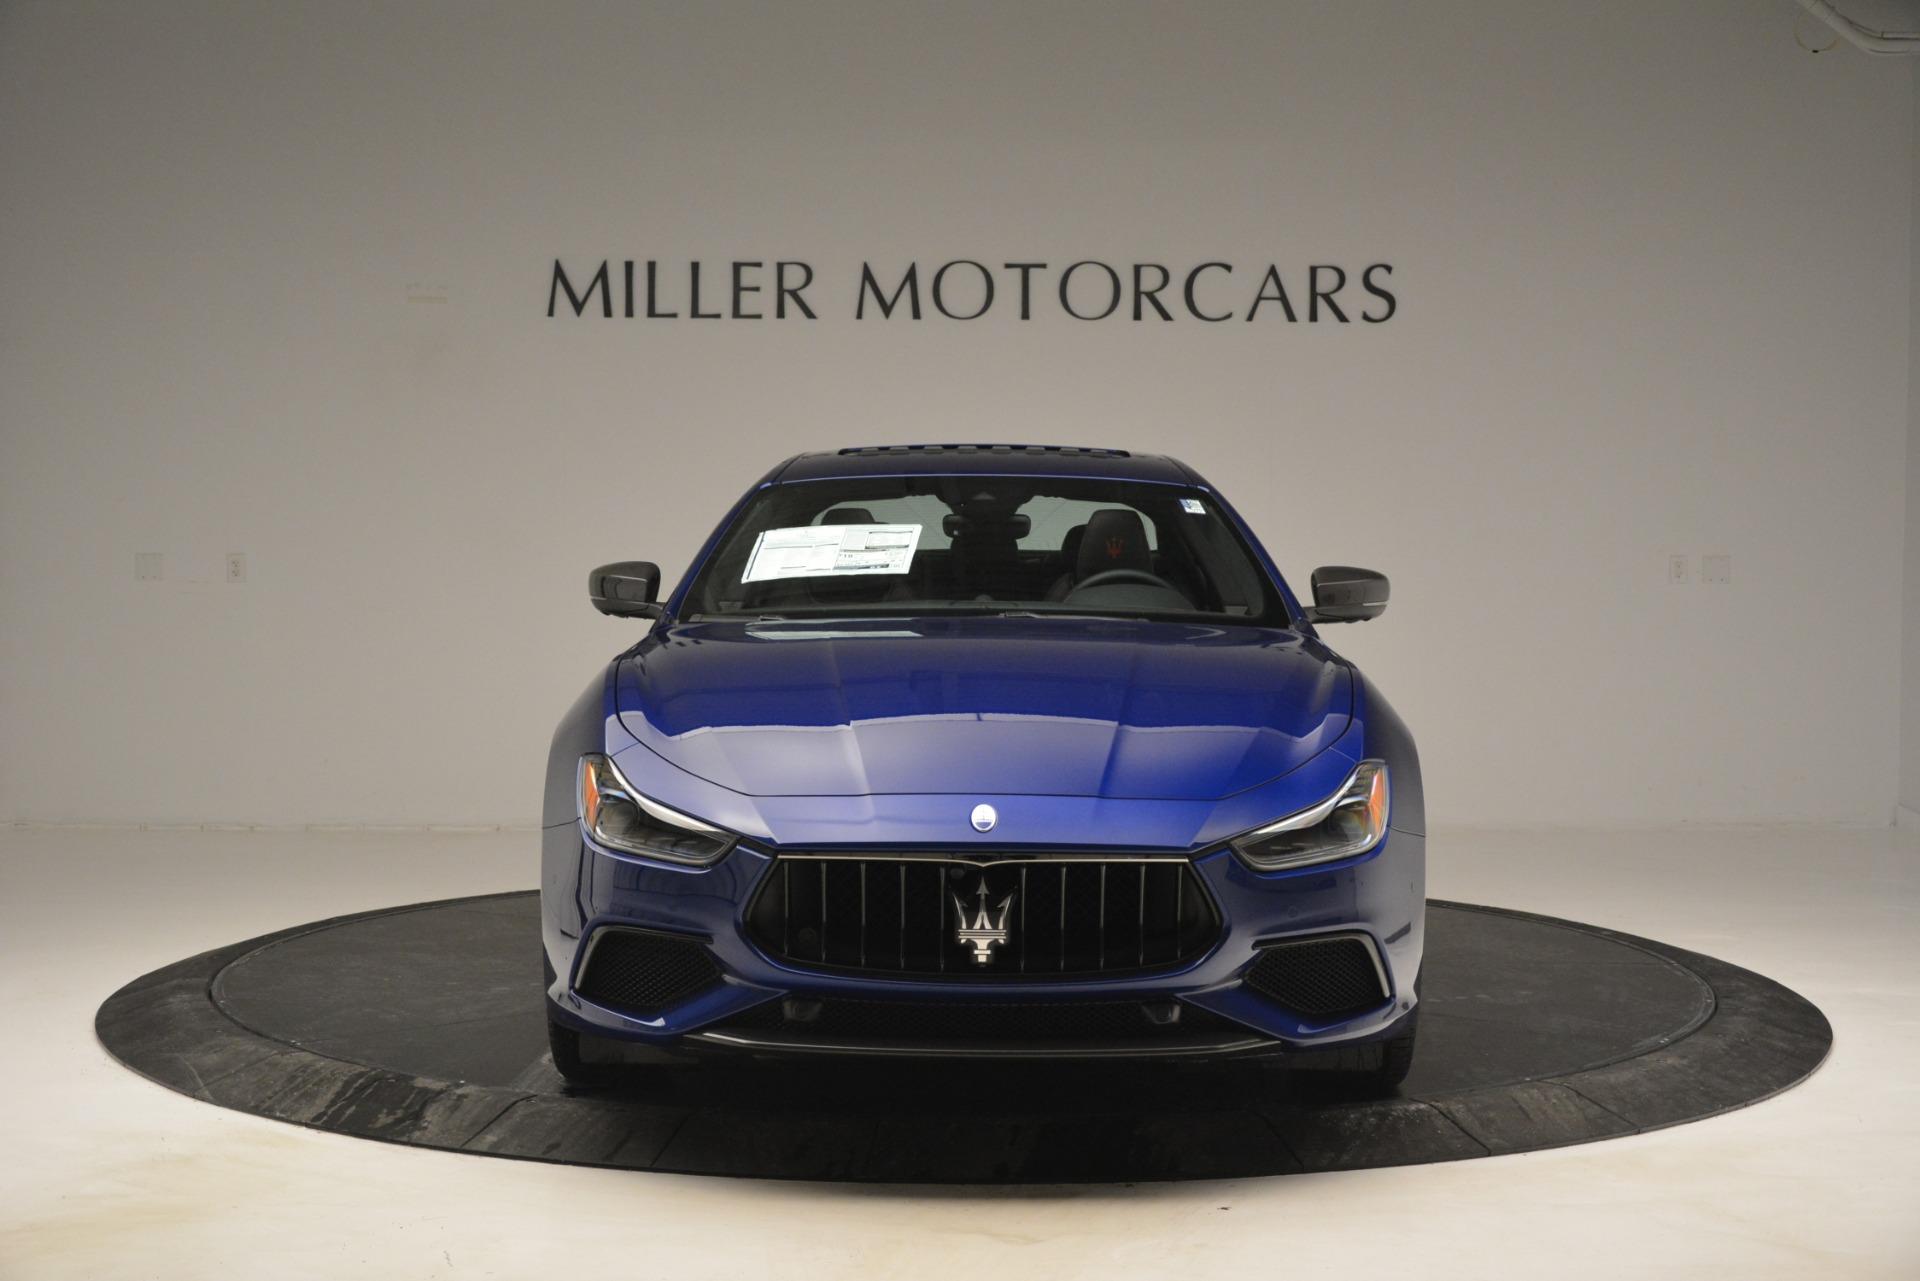 New 2019 Maserati Ghibli S Q4 GranSport For Sale In Westport, CT 2978_p12